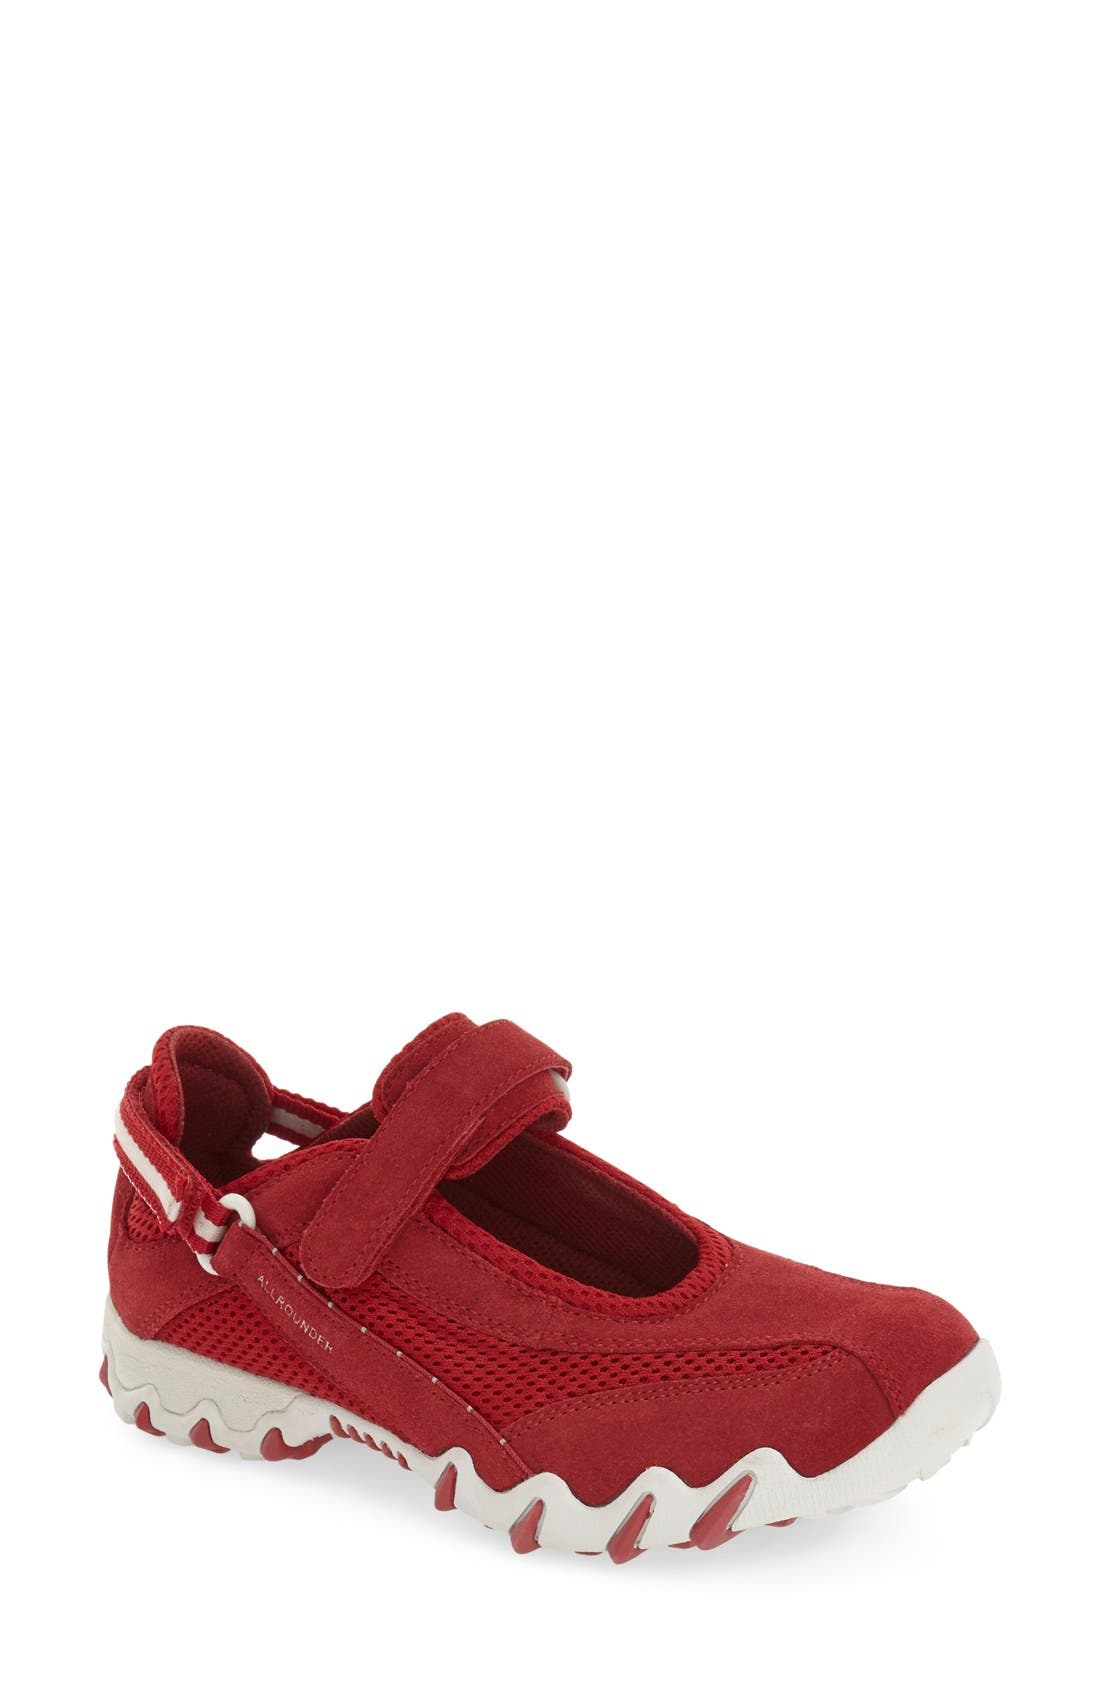 ALLROUNDER BY MEPHISTO Niro Athletic Shoe